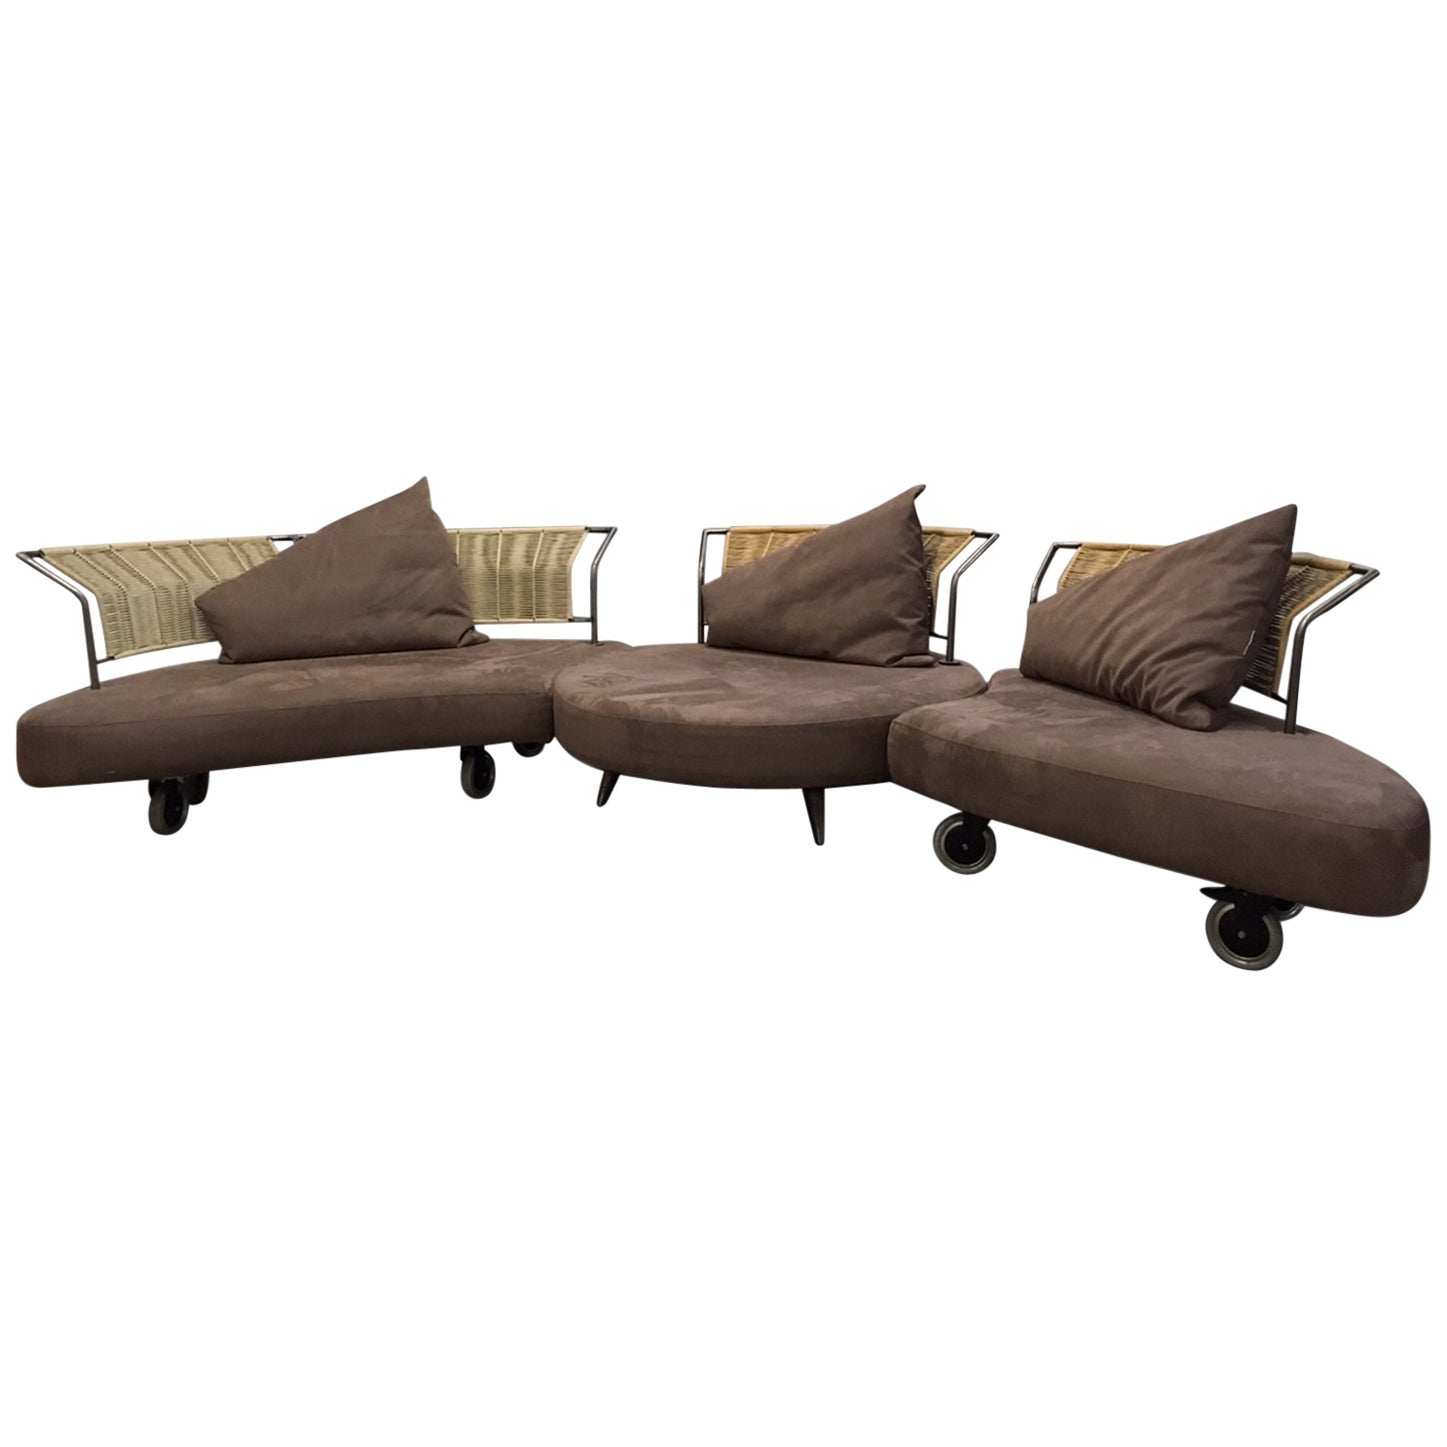 Fantasy Islands Movable Sofa, Sofa Bed by Kurt Beier, circa 1980s